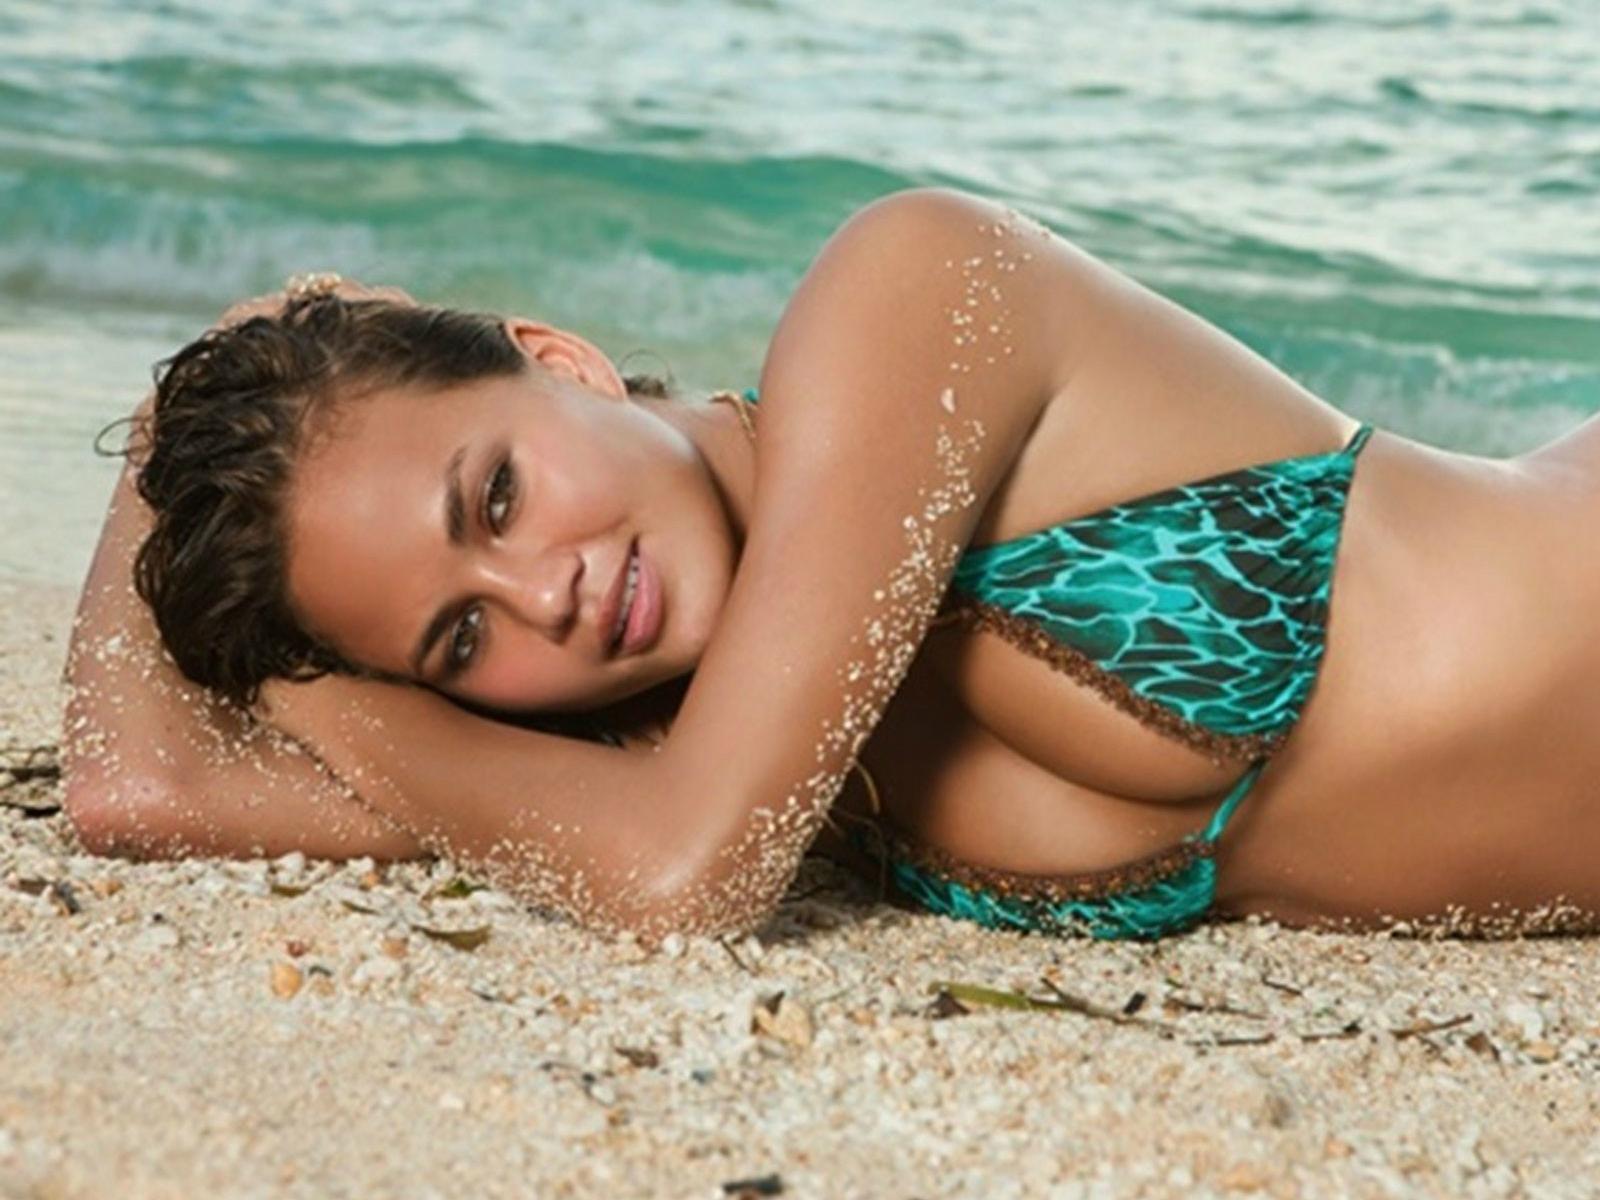 http://3.bp.blogspot.com/-lT5HlkccL3I/Tl3UiRRb6fI/AAAAAAAAAws/eJQ4liuV1b4/s1600/Chrissy_Teigen_beach_sexy_beauty_bikini_wallpaper_www.Vvallpaper.net.jpg